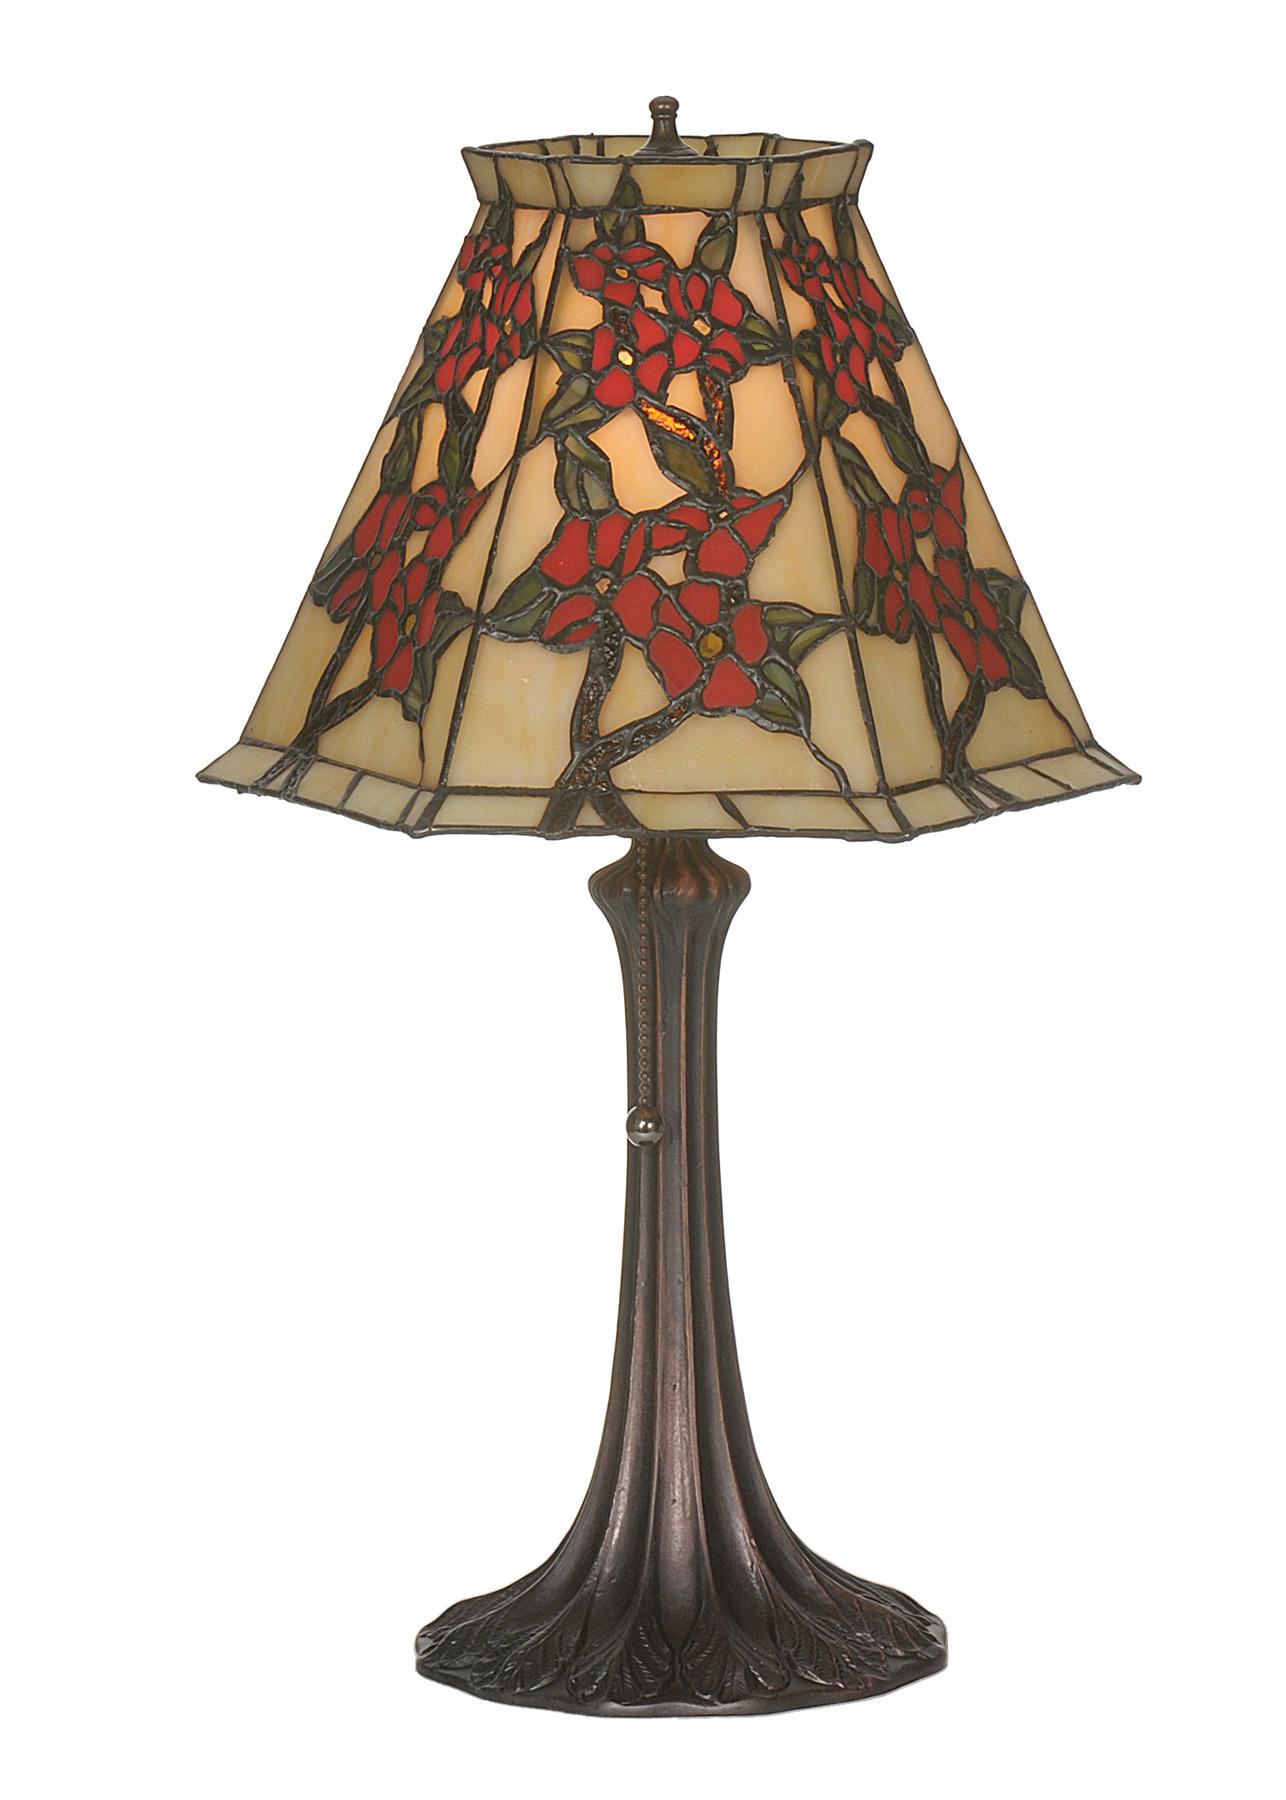 Meyda 81620 Tiffany Oriental Peony Accent Lamp